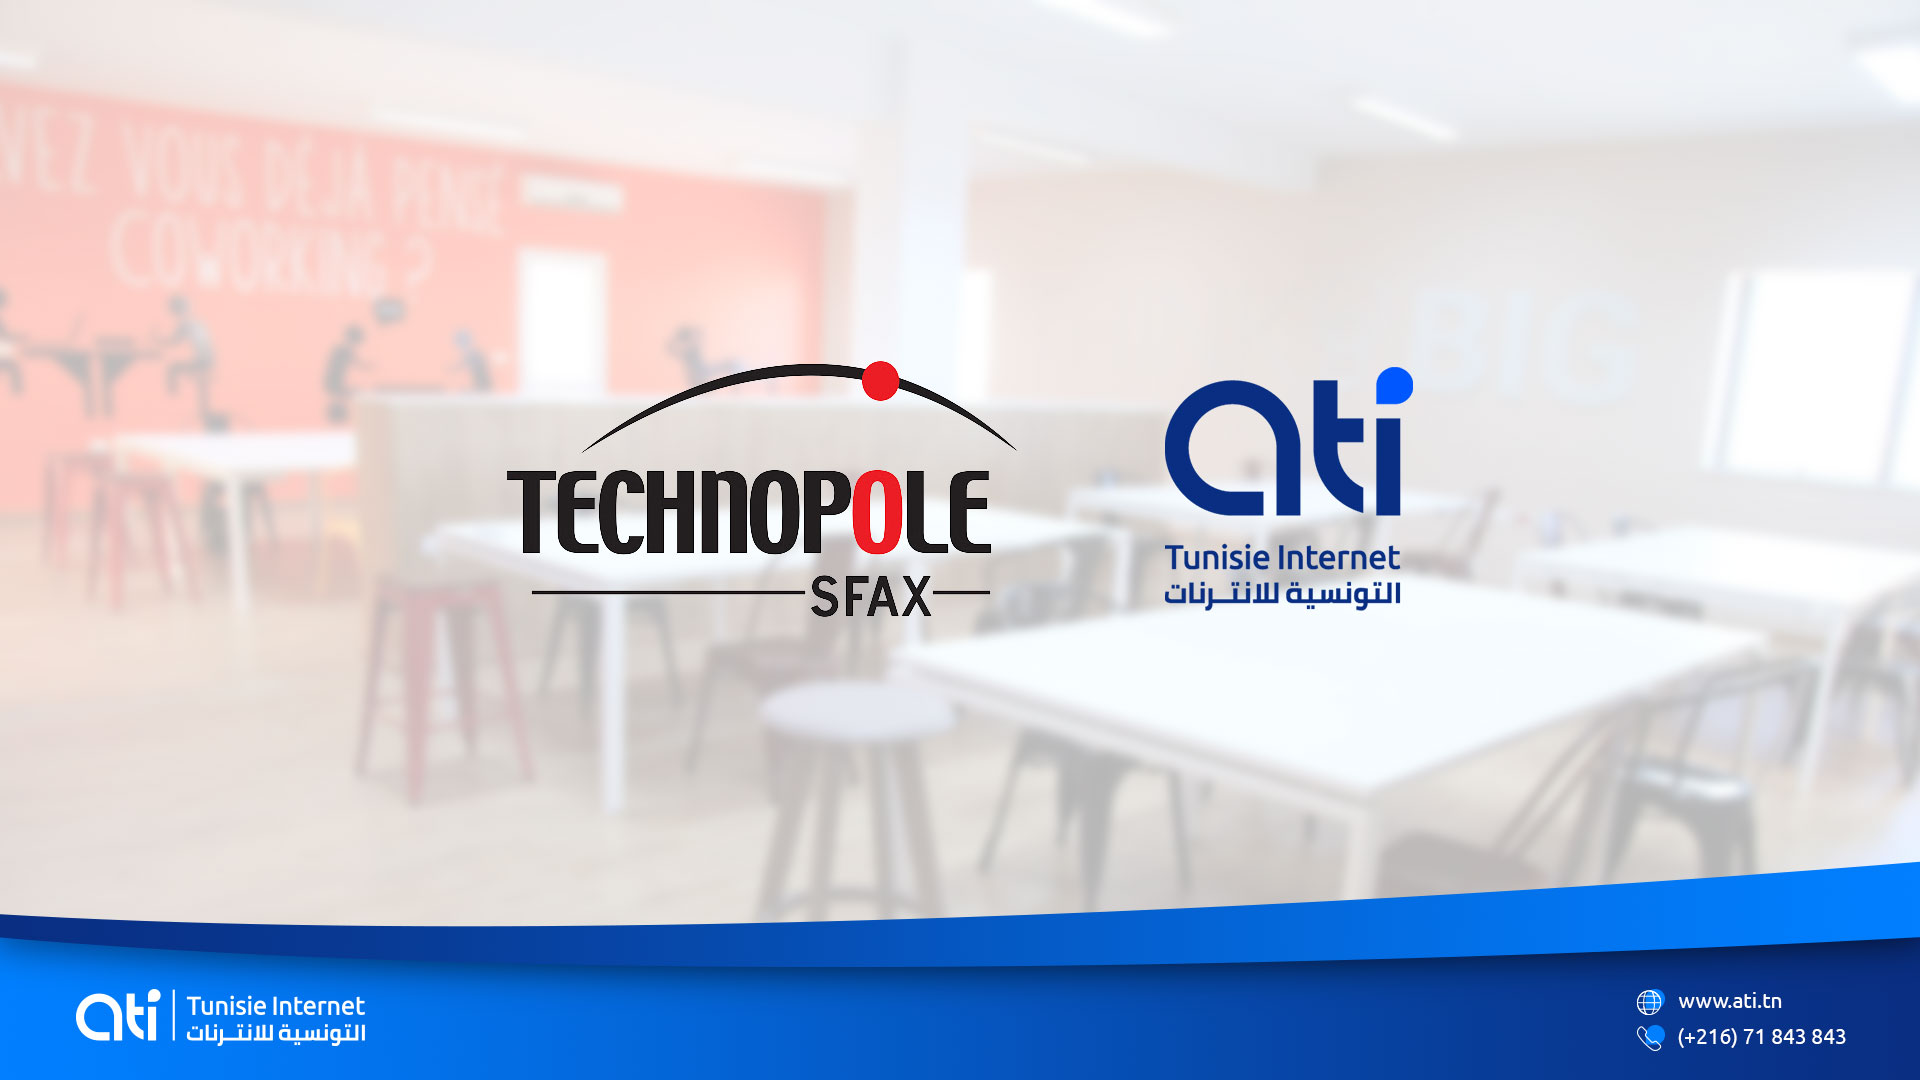 L'ATI co-organise avec le Technopole de Sfax «Tunisian Smart Cities Online Hackathon».